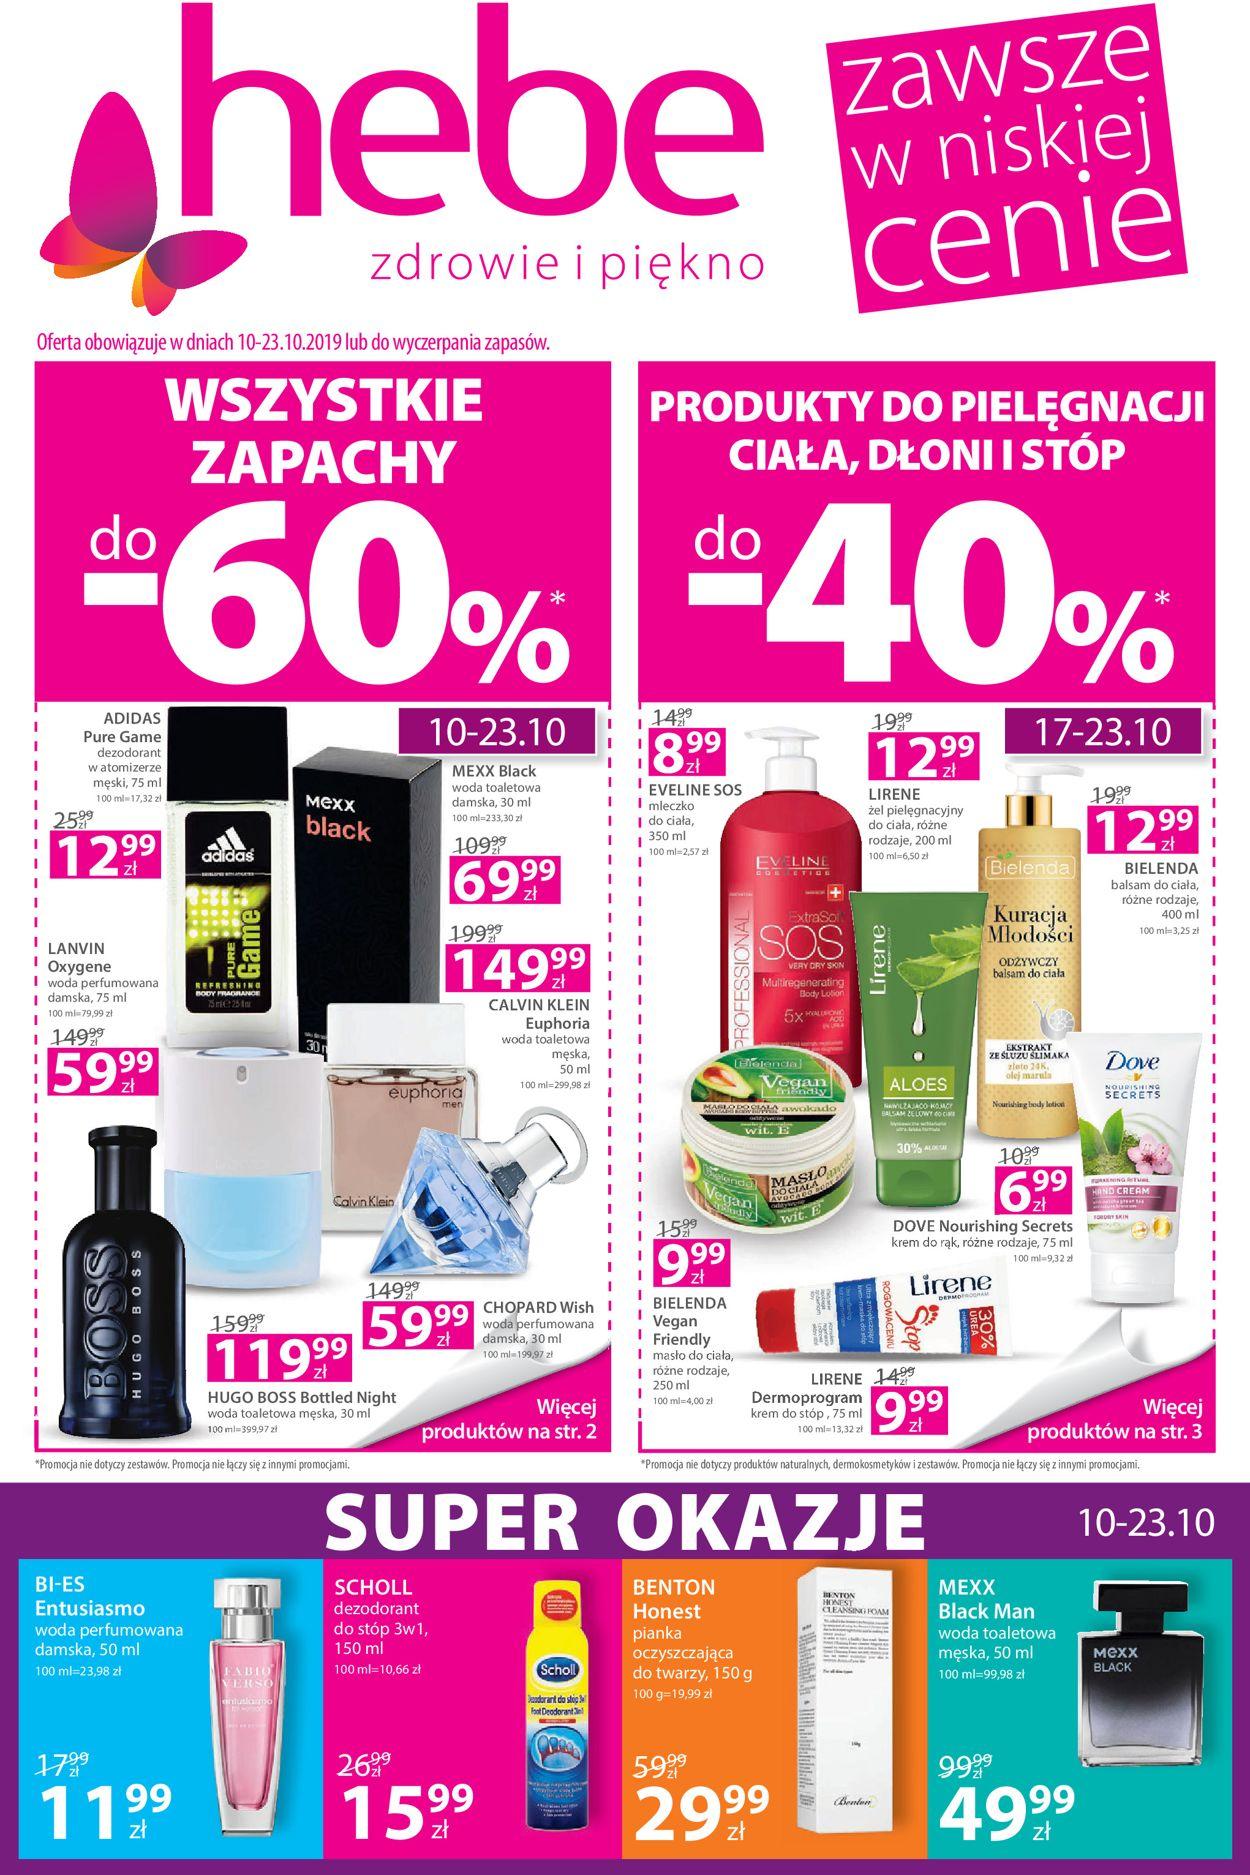 Gazetka promocyjna Hebe - 10.10-23.10.2019